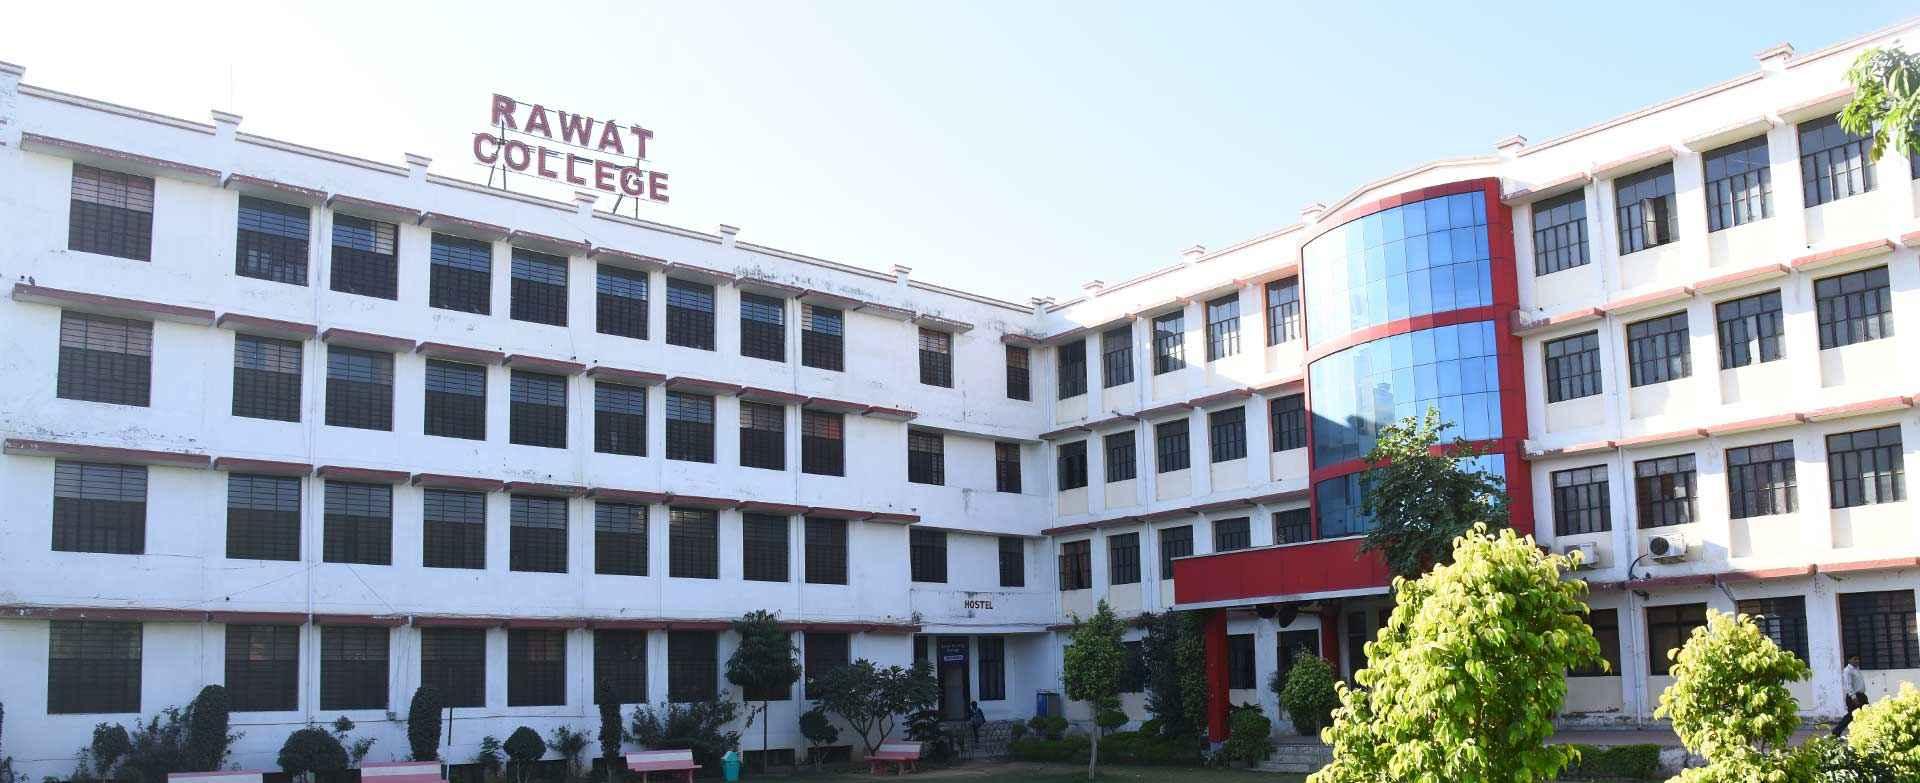 rawatnursingcollege